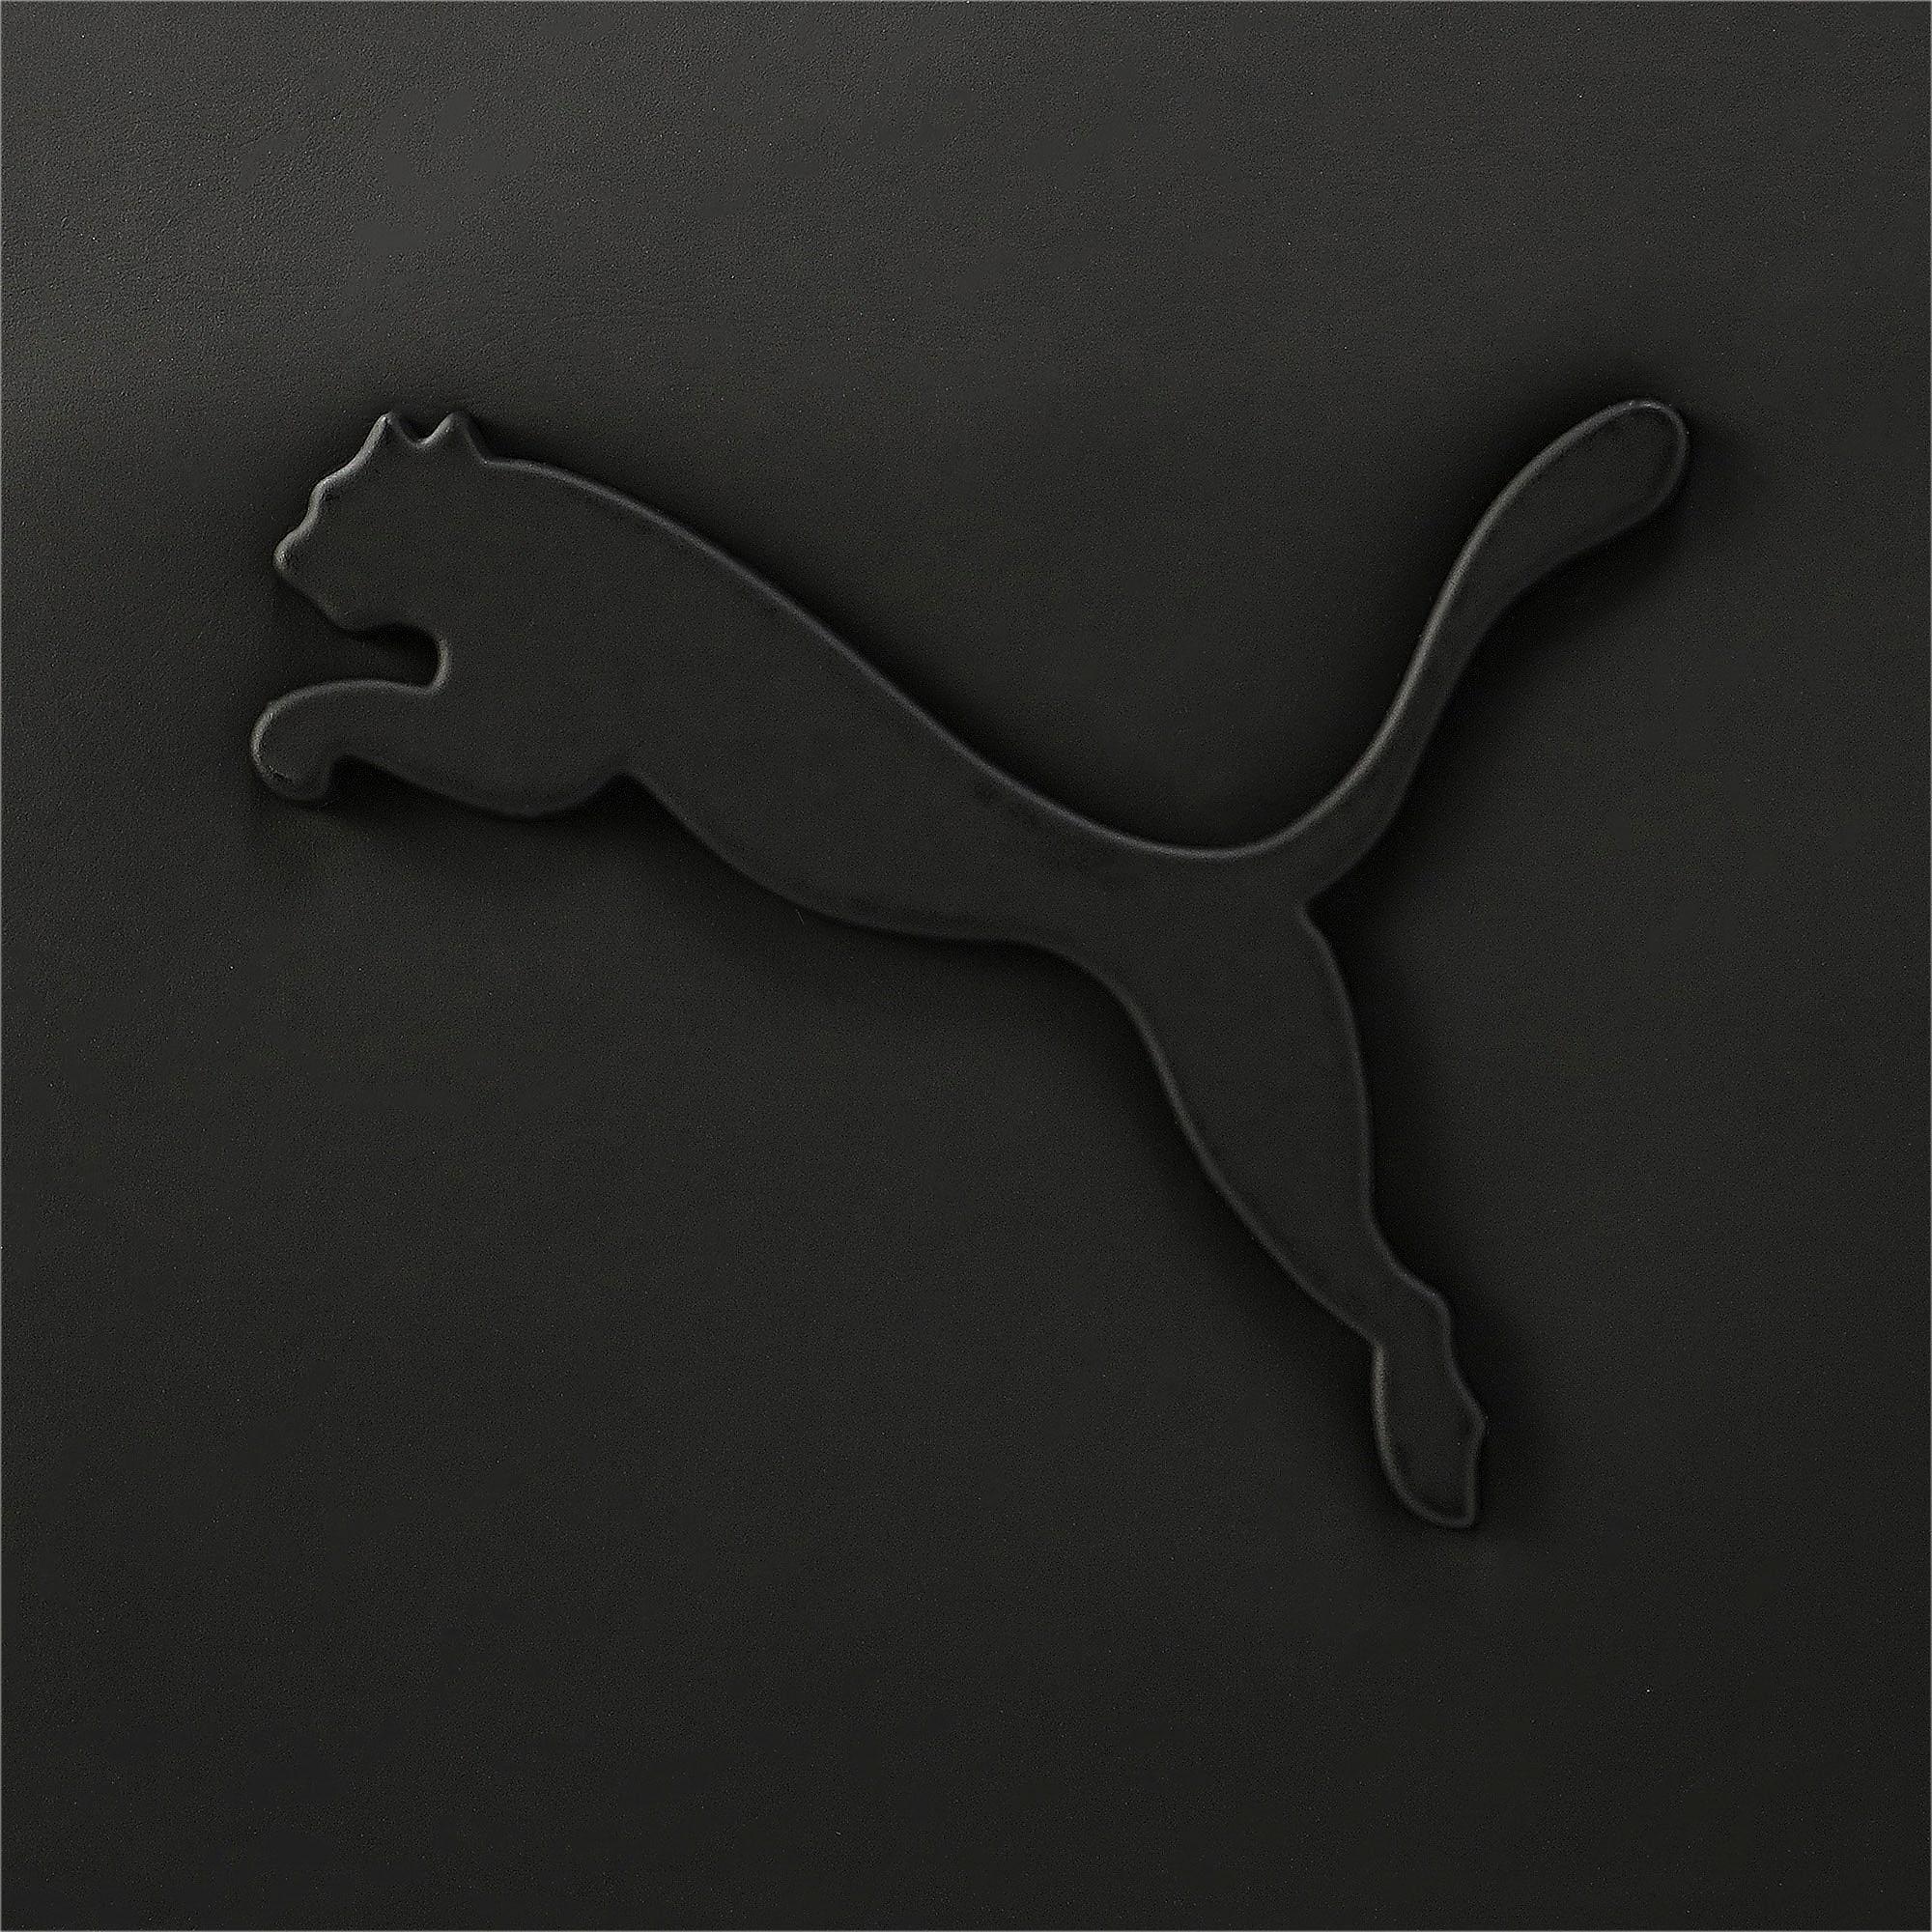 Thumbnail 6 of フェラーリ LS ウィークエンダー (29L), Puma Black, medium-JPN